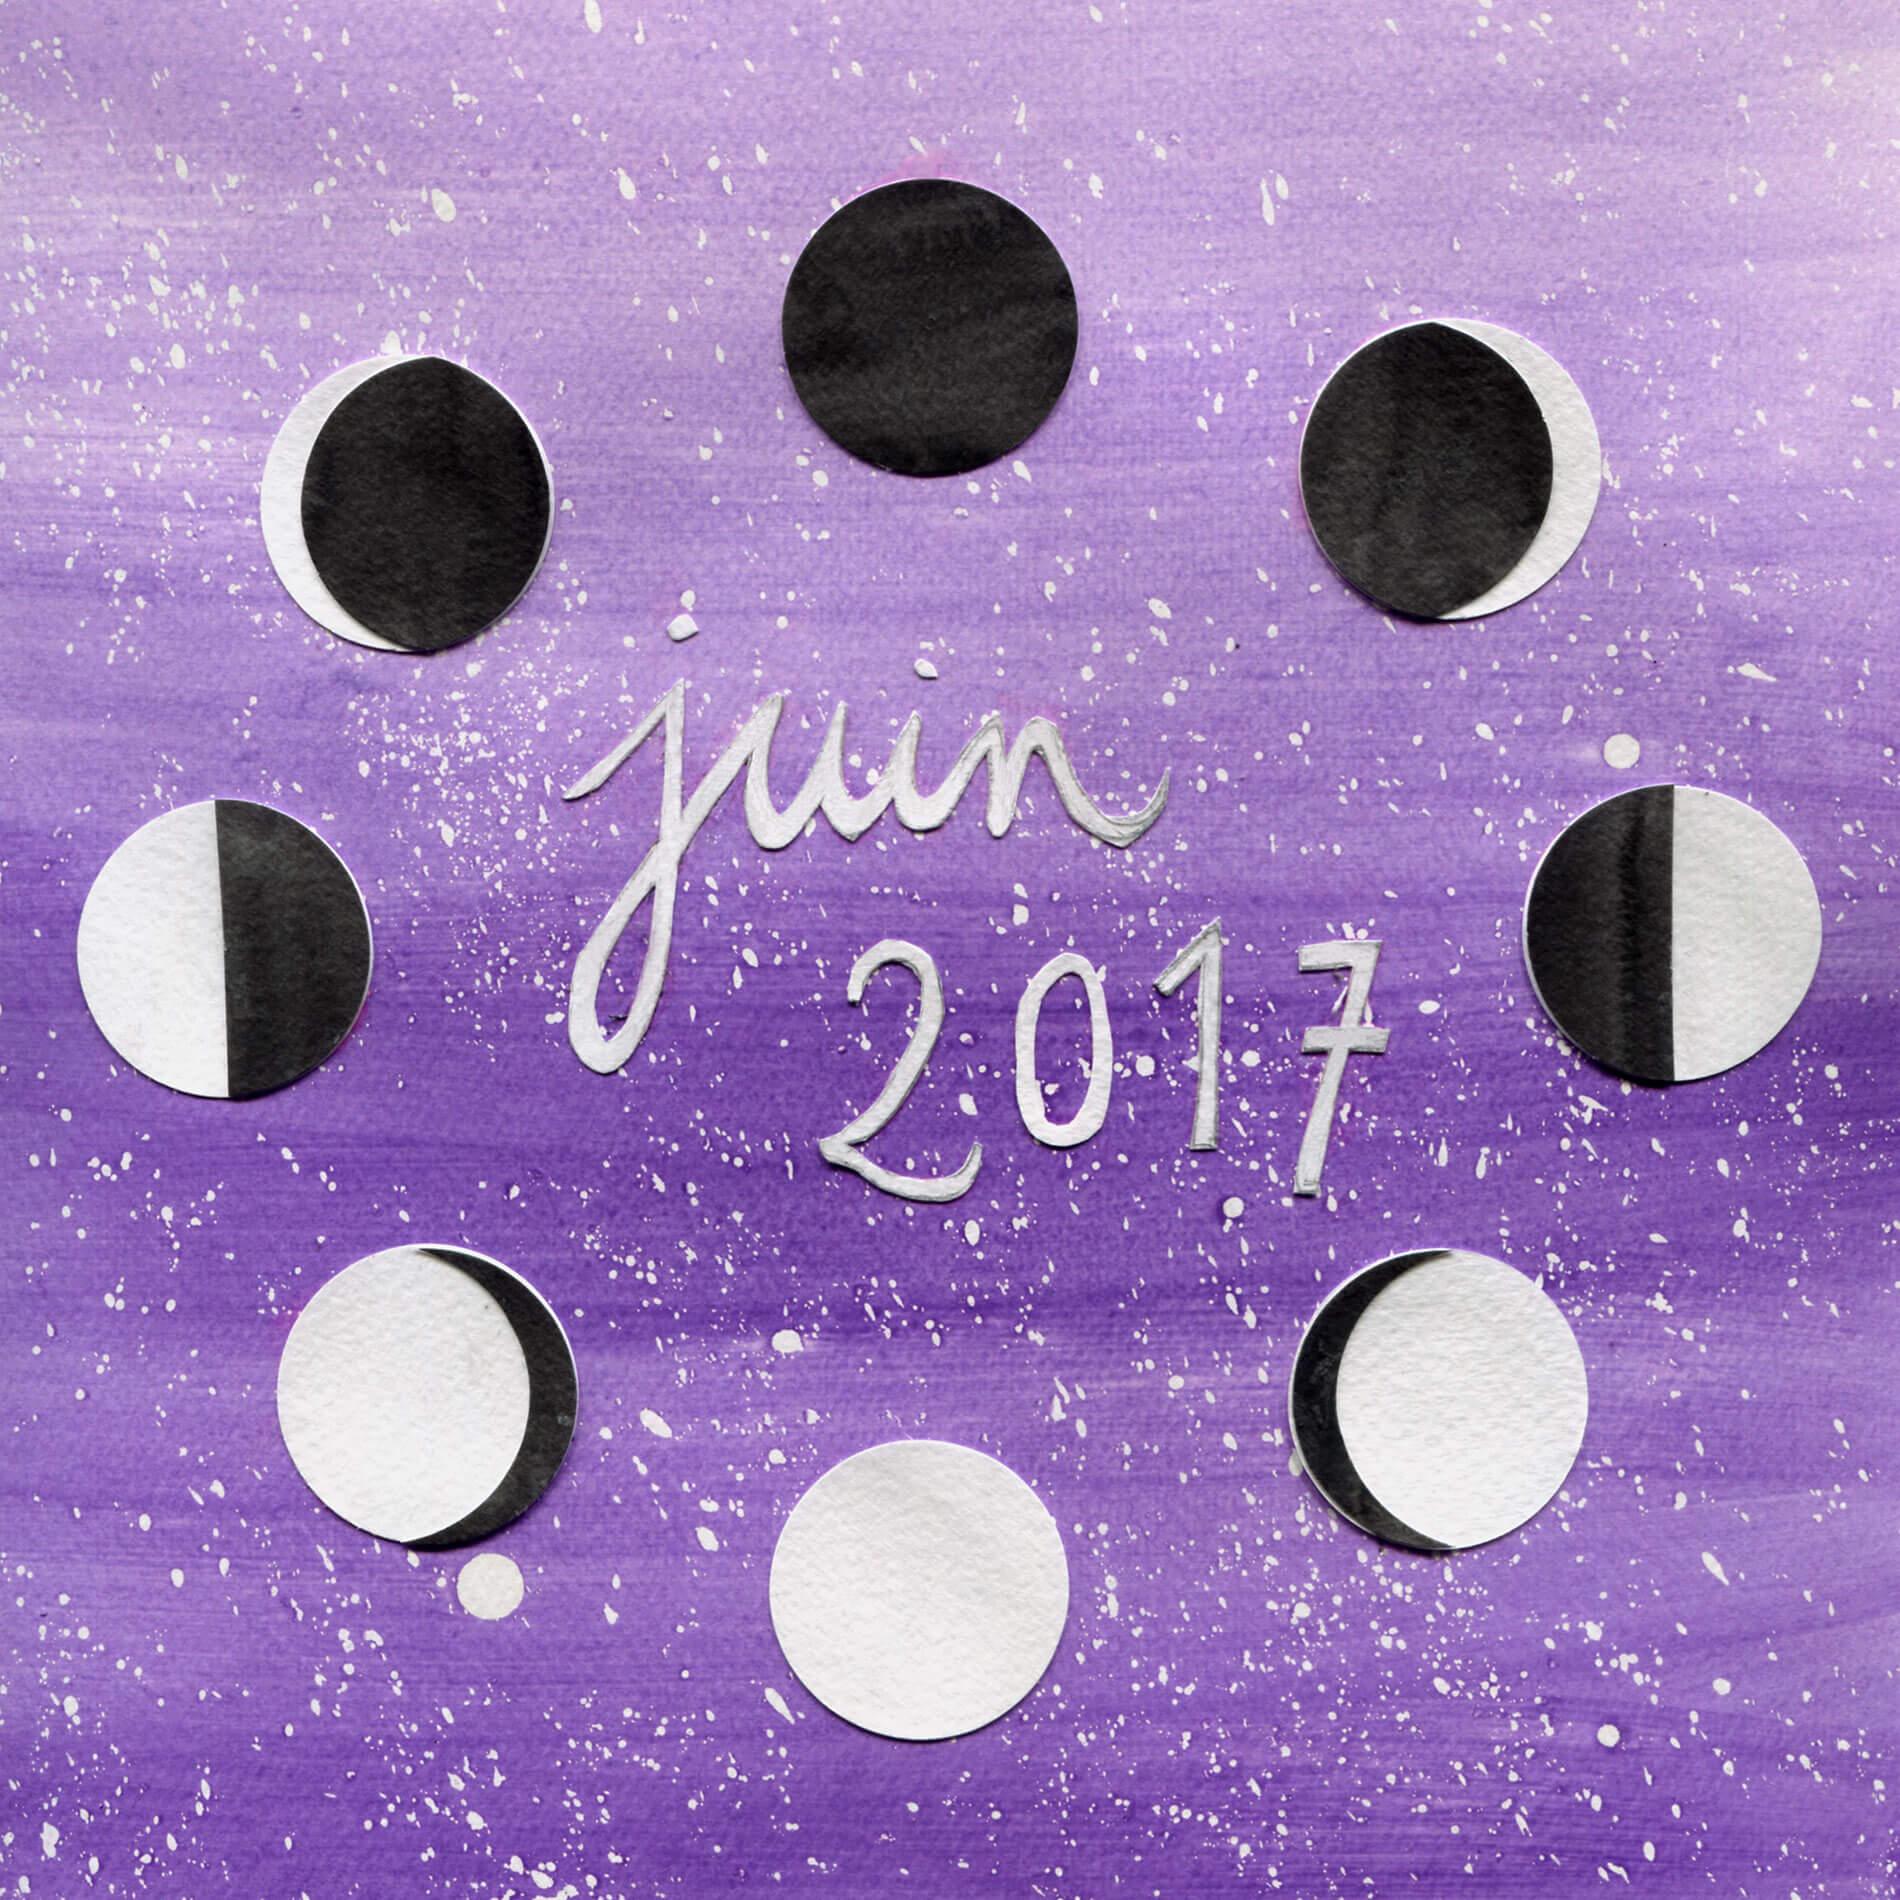 Juin 2017 mes favoris inspiration la lune mauve - Lune descendante juin 2017 ...